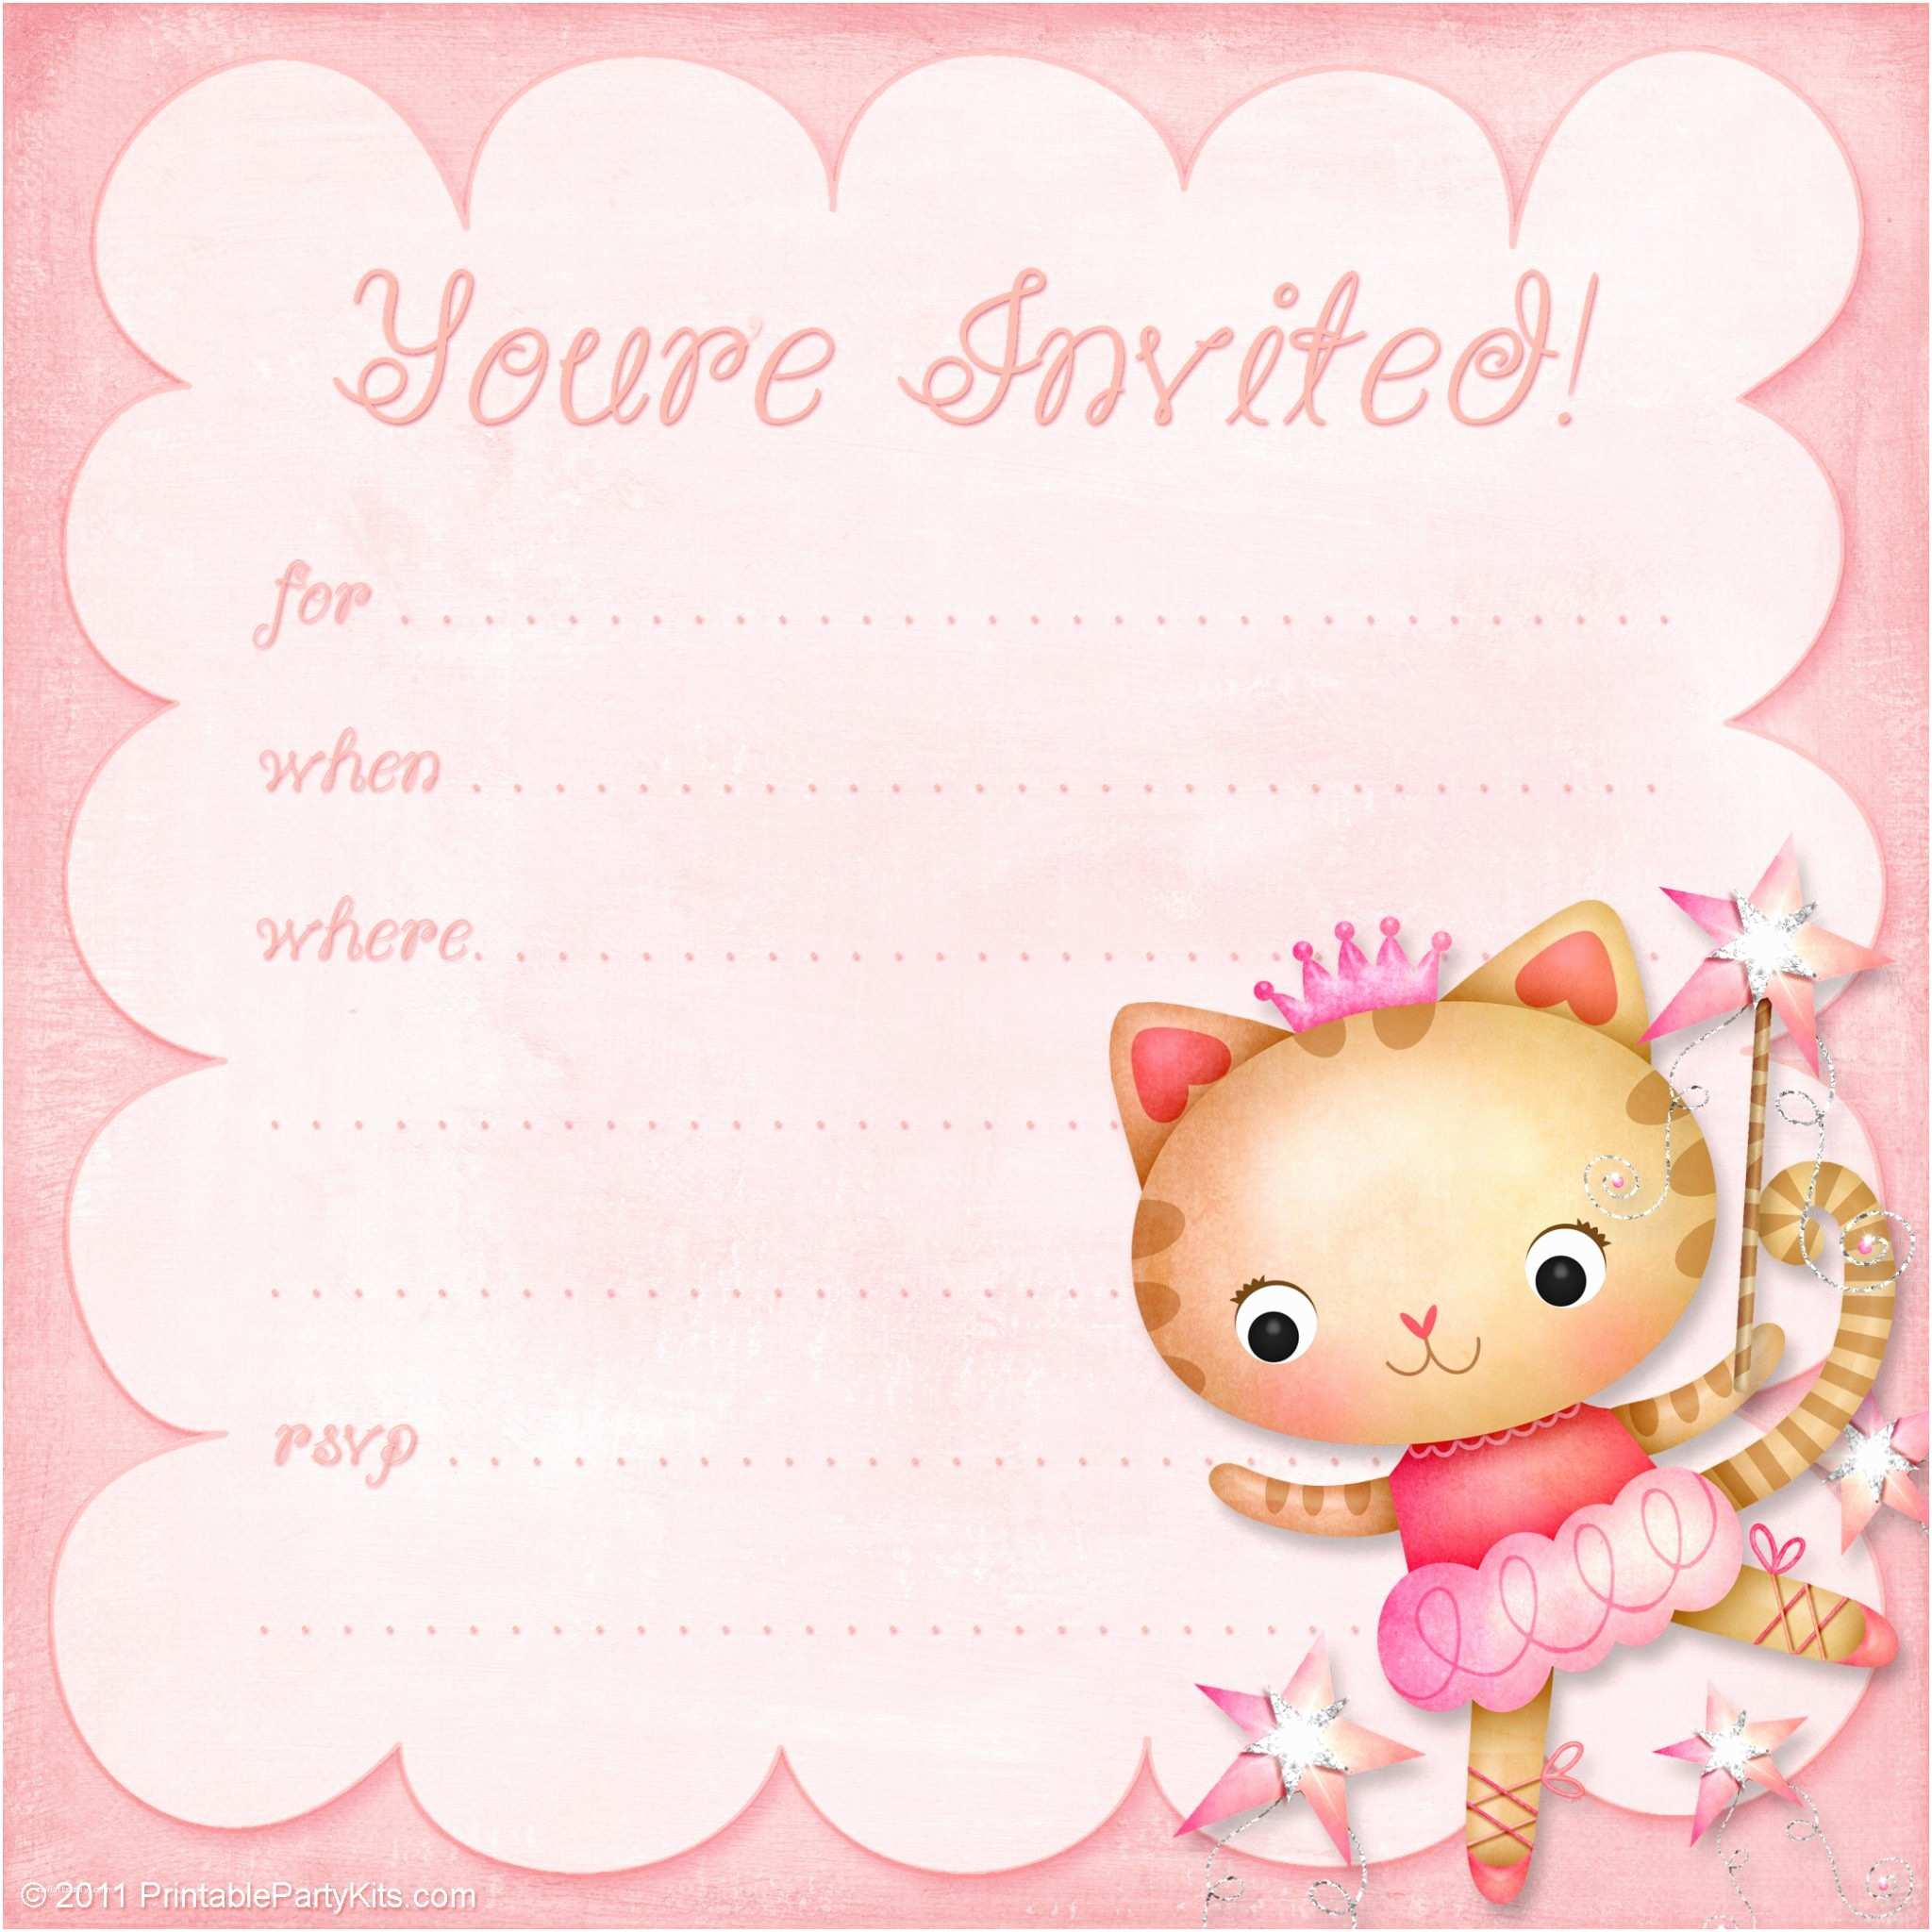 Girl Birthday Party Invitations Girls Birthday Party Invitation Princess Ballerina